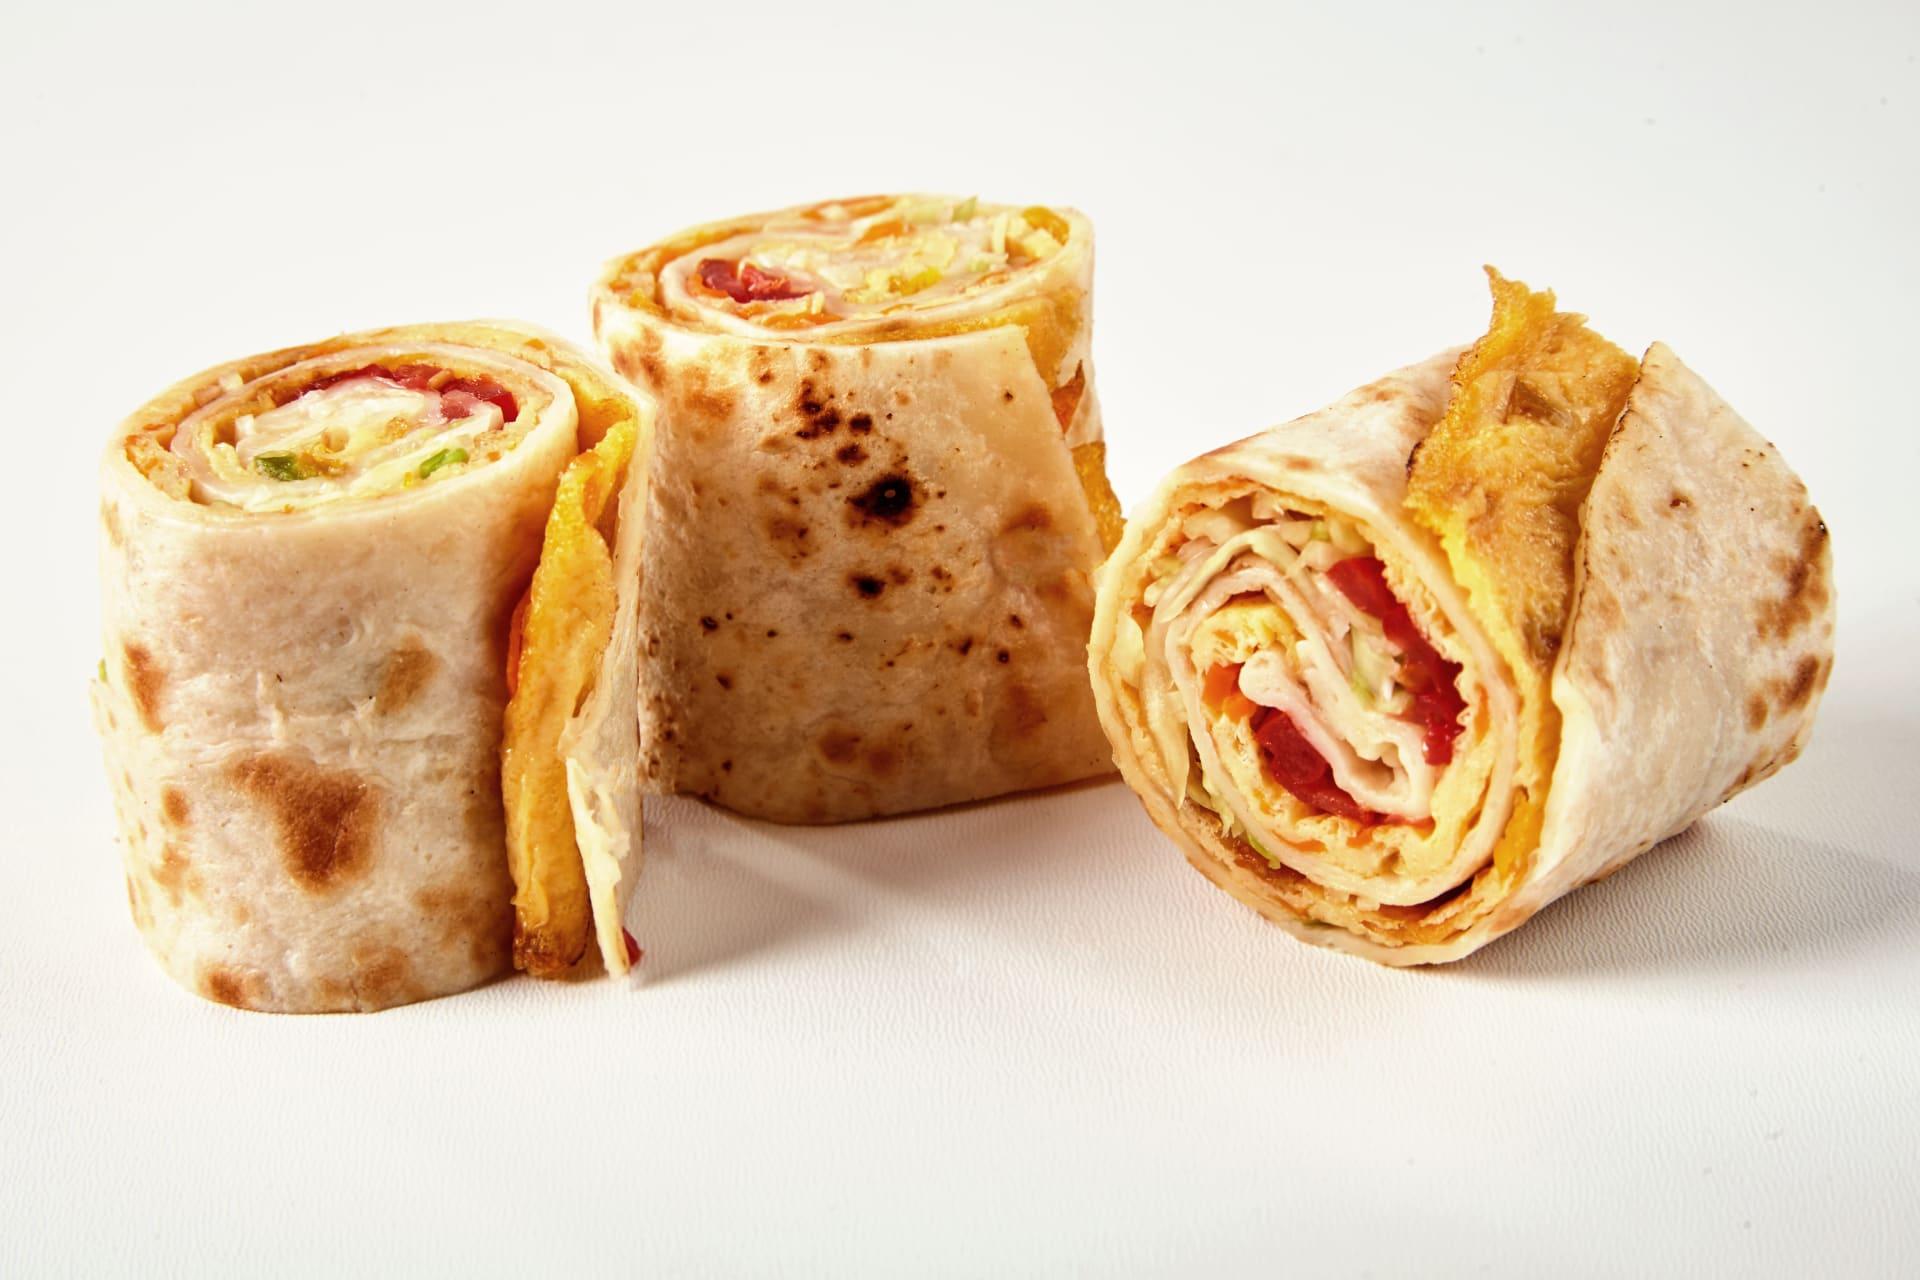 Kampala - My Rolex!!: Kampala's Favorite Food Snack